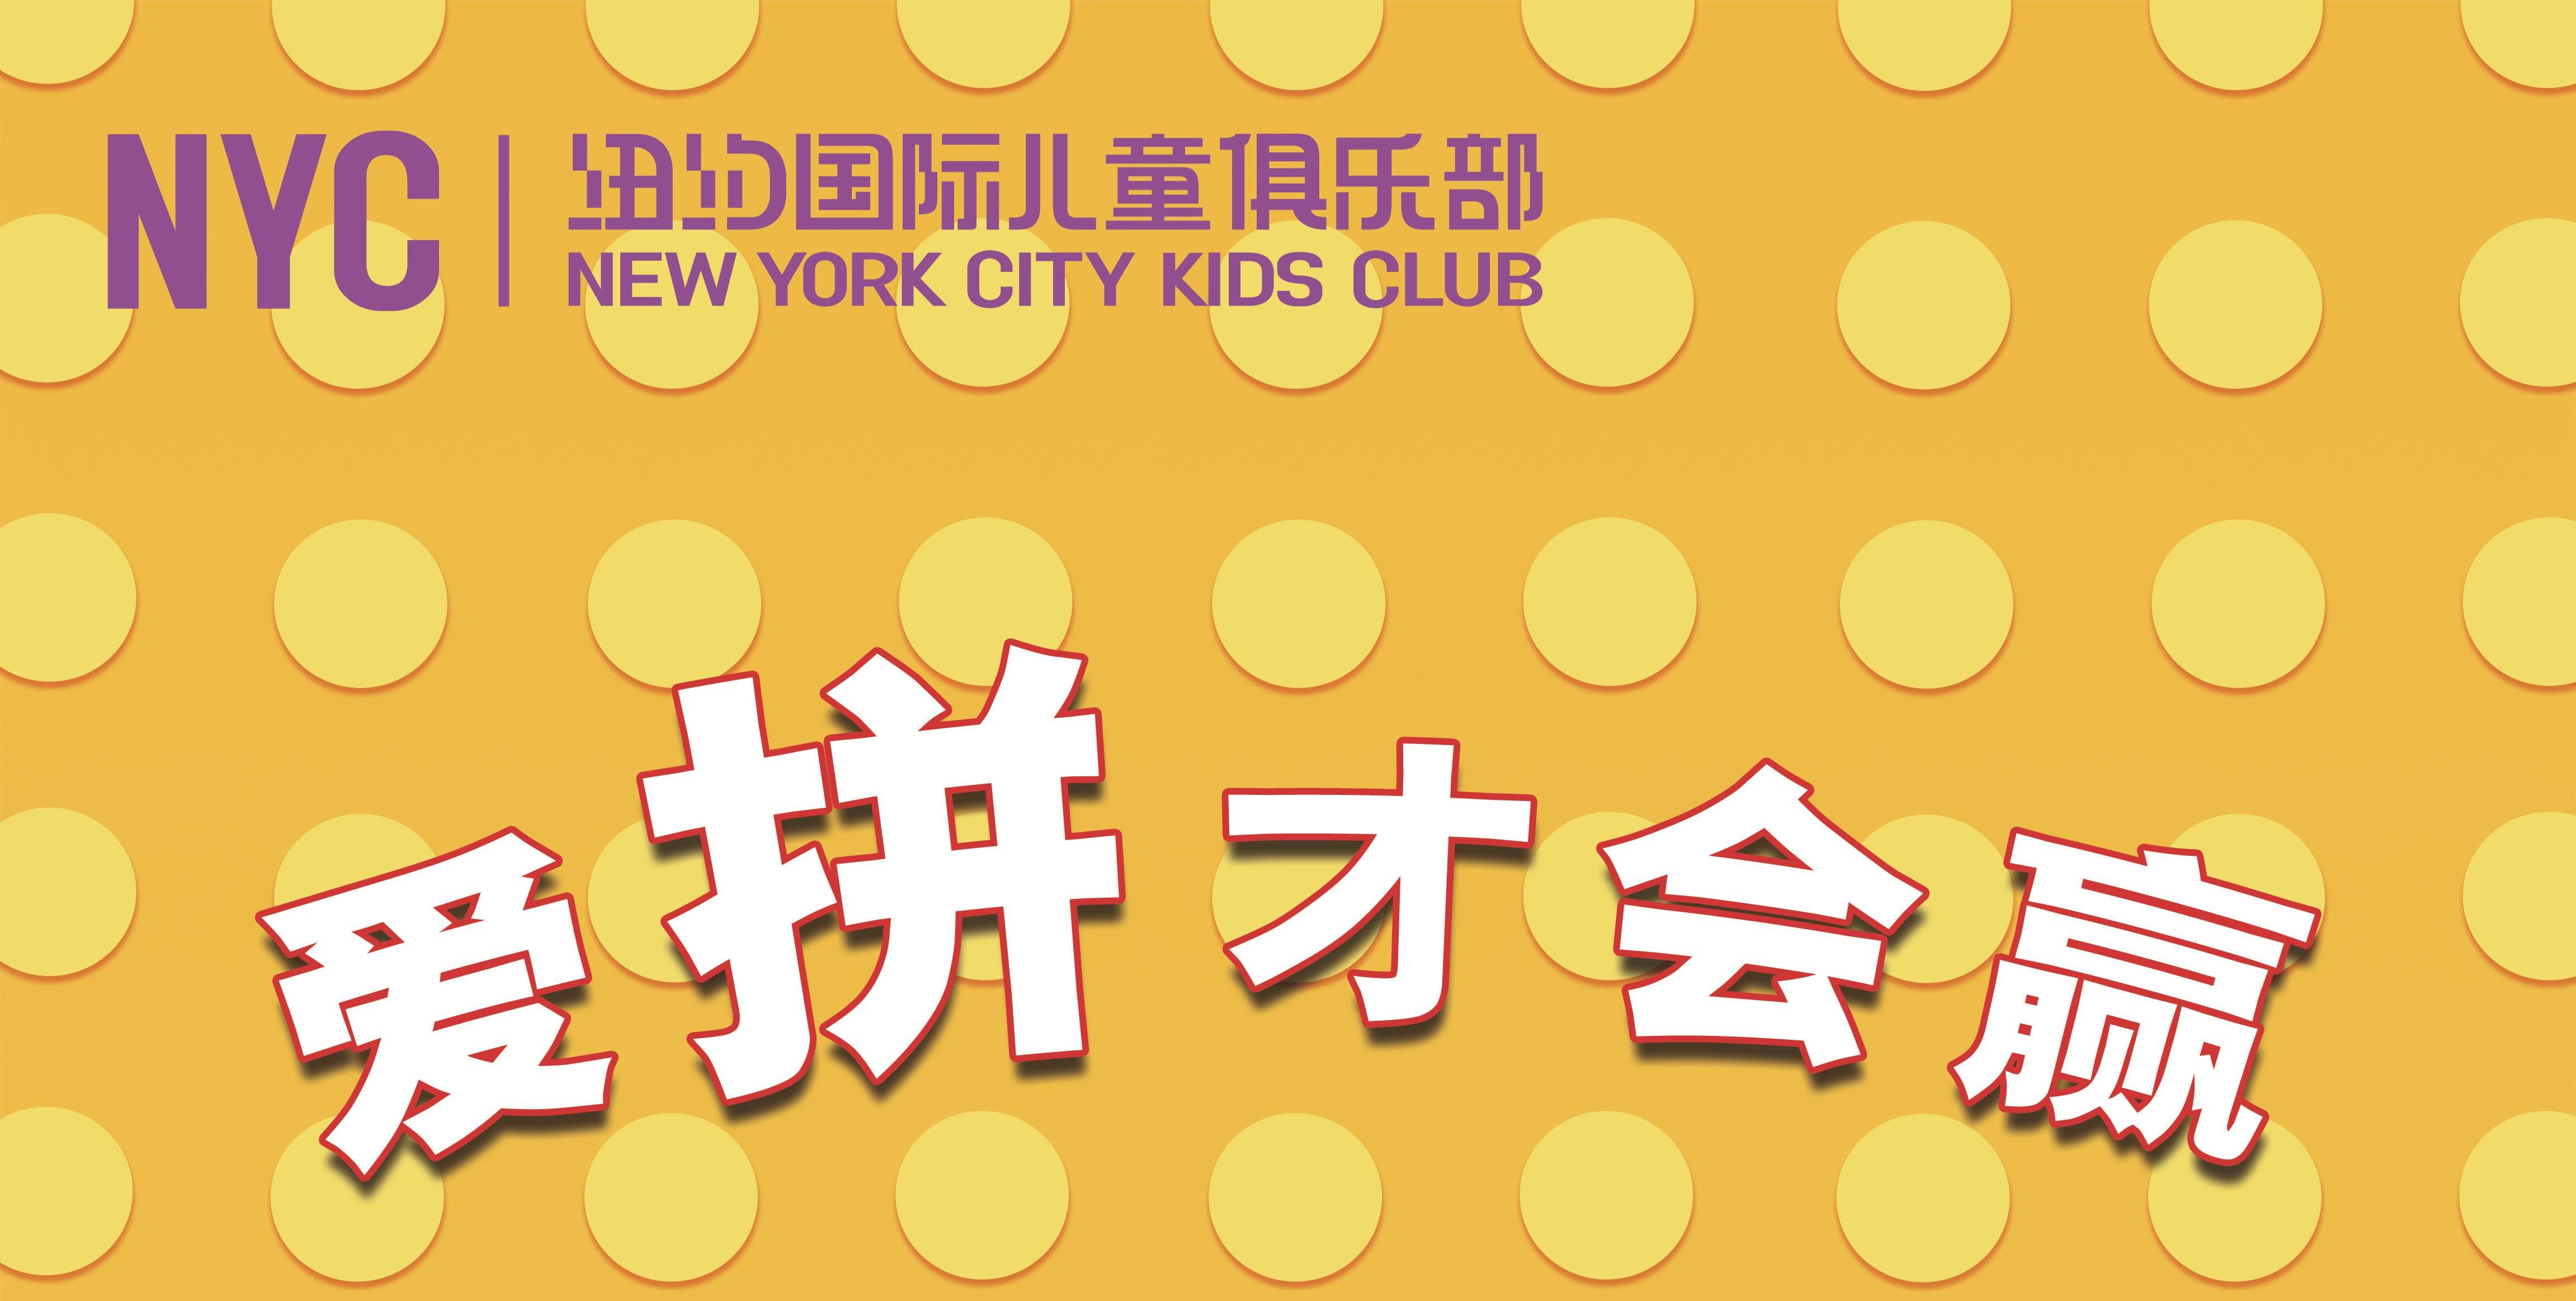 NYC丰台和谐早教中心:乐高兴趣班活动预告